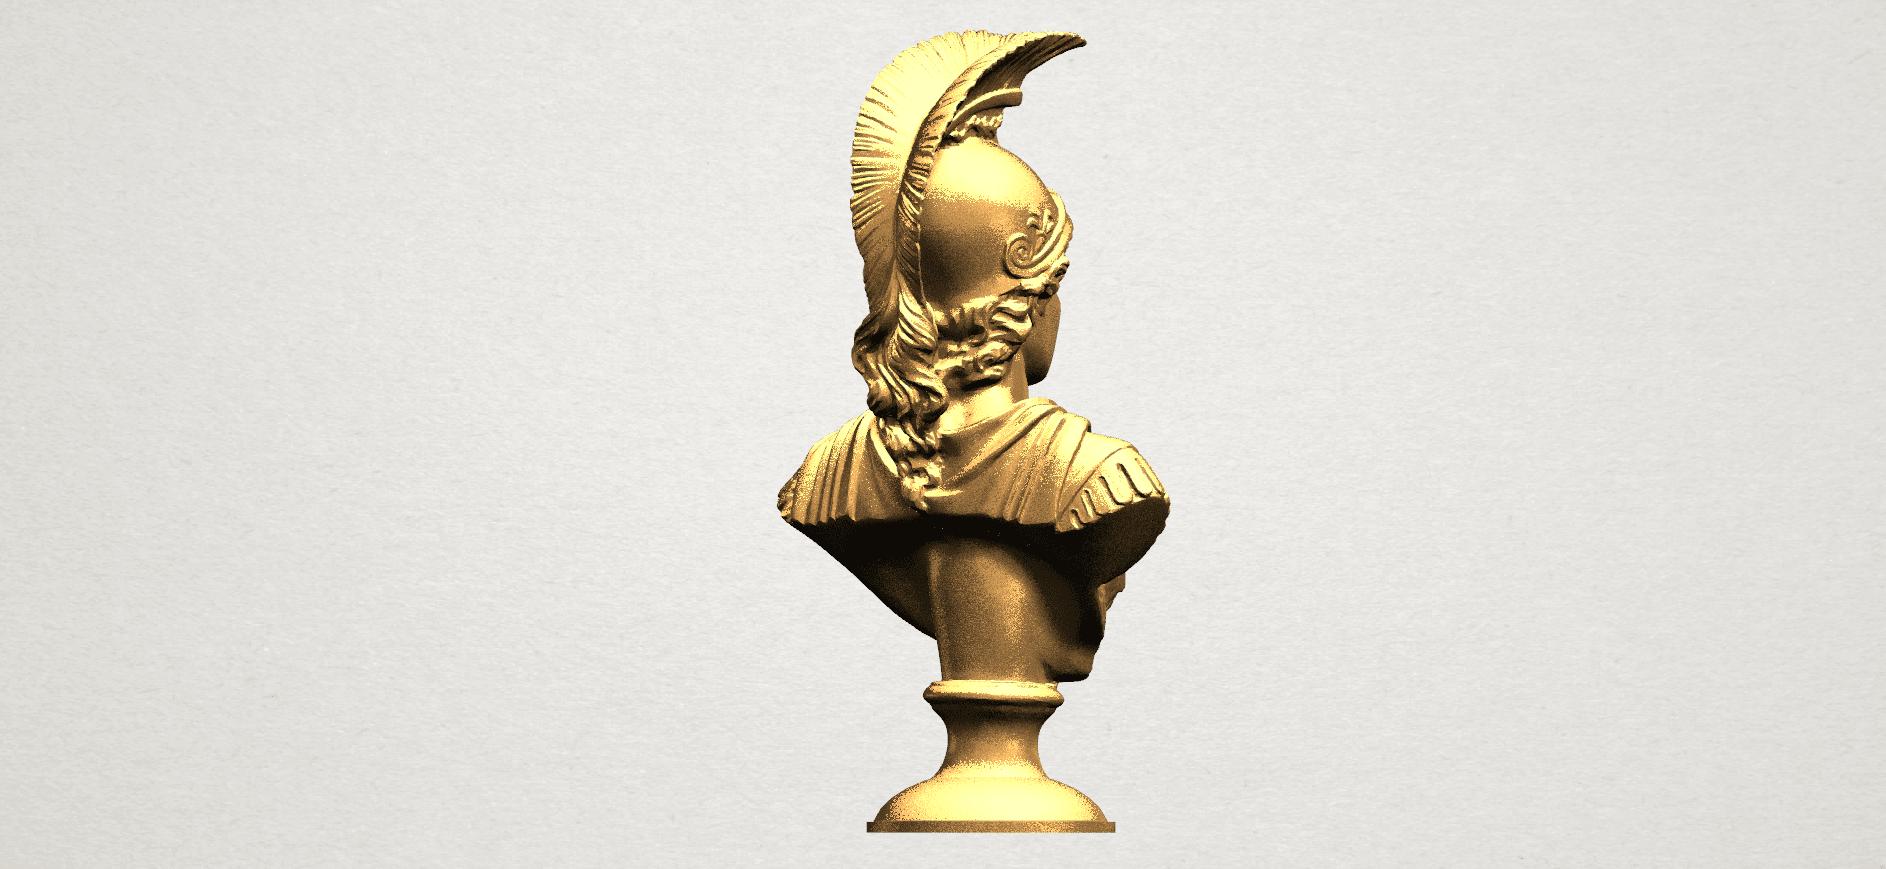 Alexander A07.png Download free STL file Alexander • 3D printer object, GeorgesNikkei